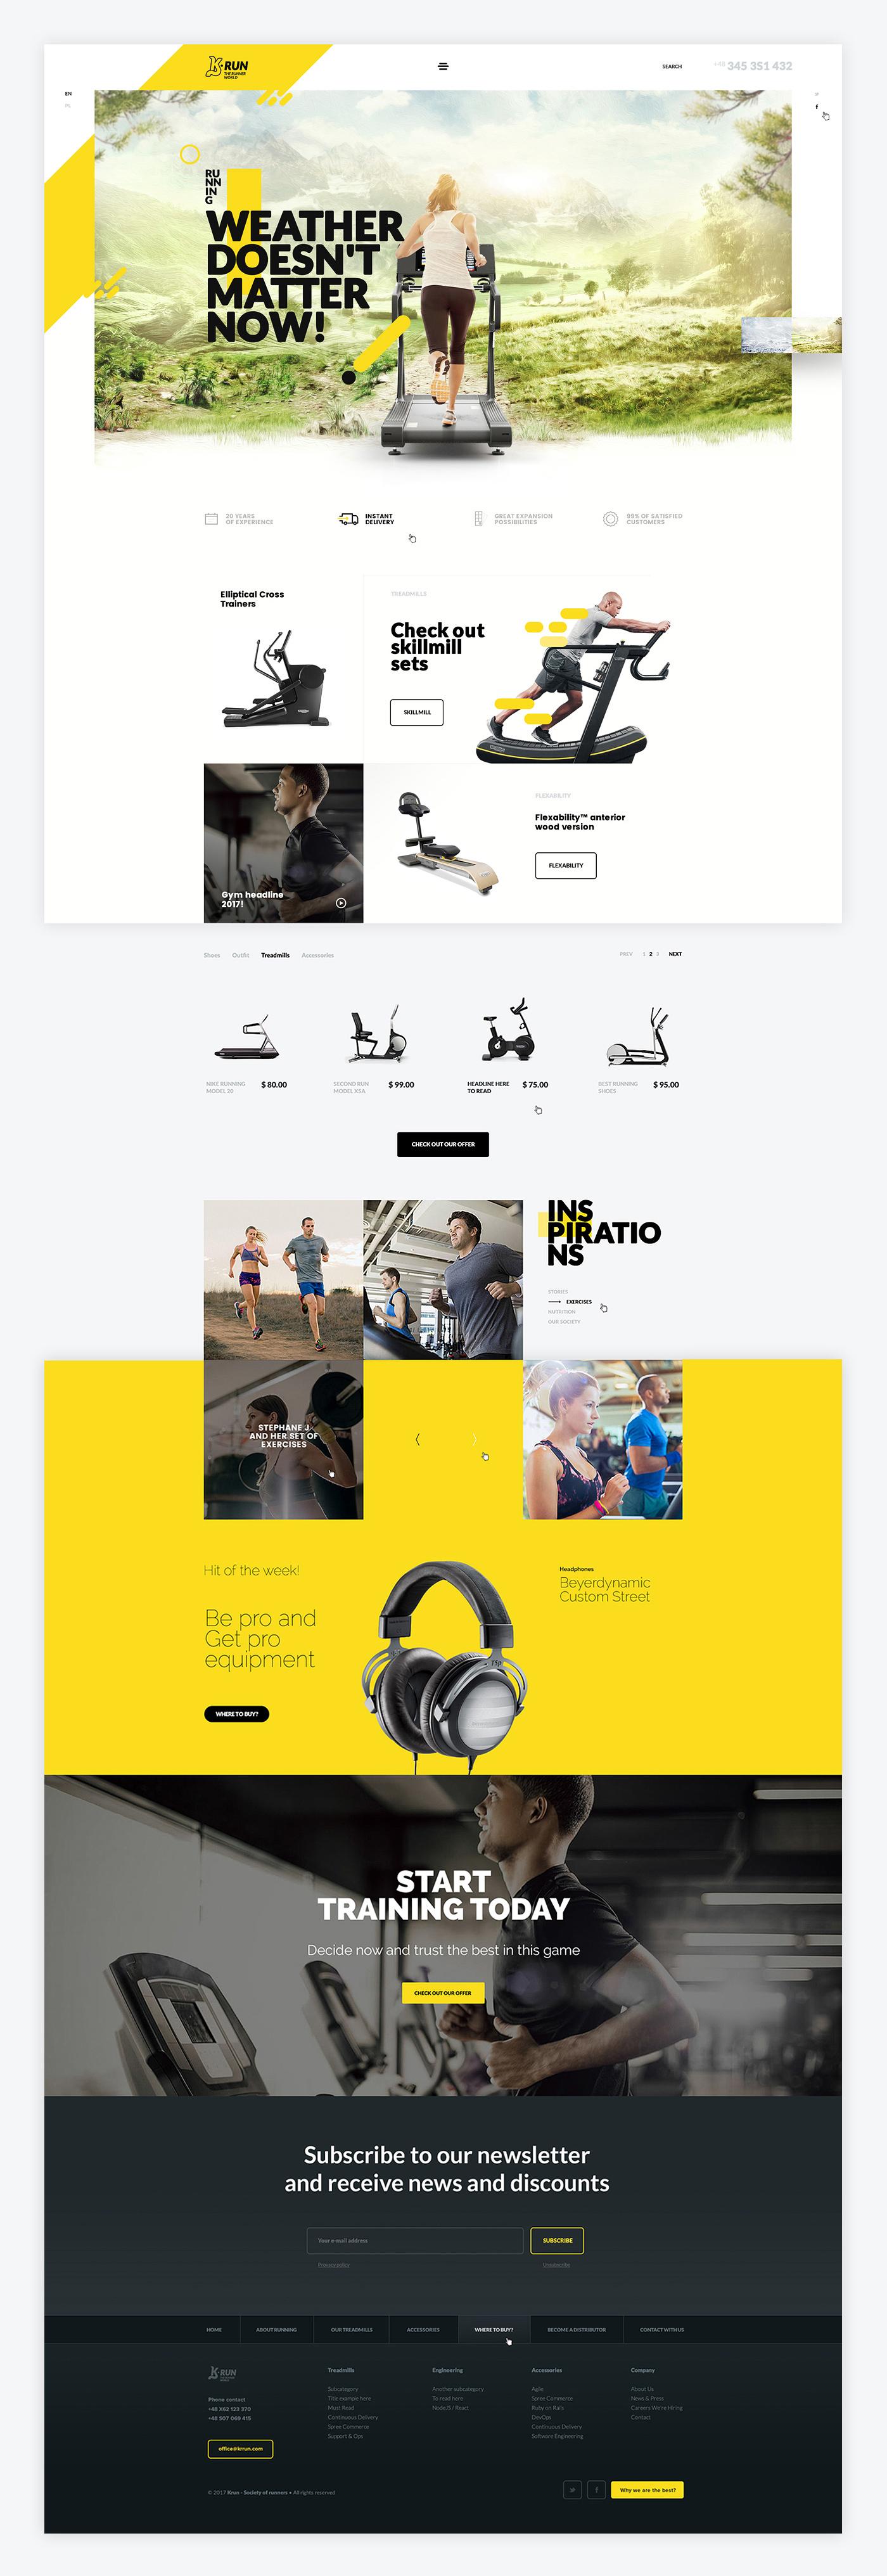 Website running jogging sport gym exercises treadmills Treadmill yellow modern